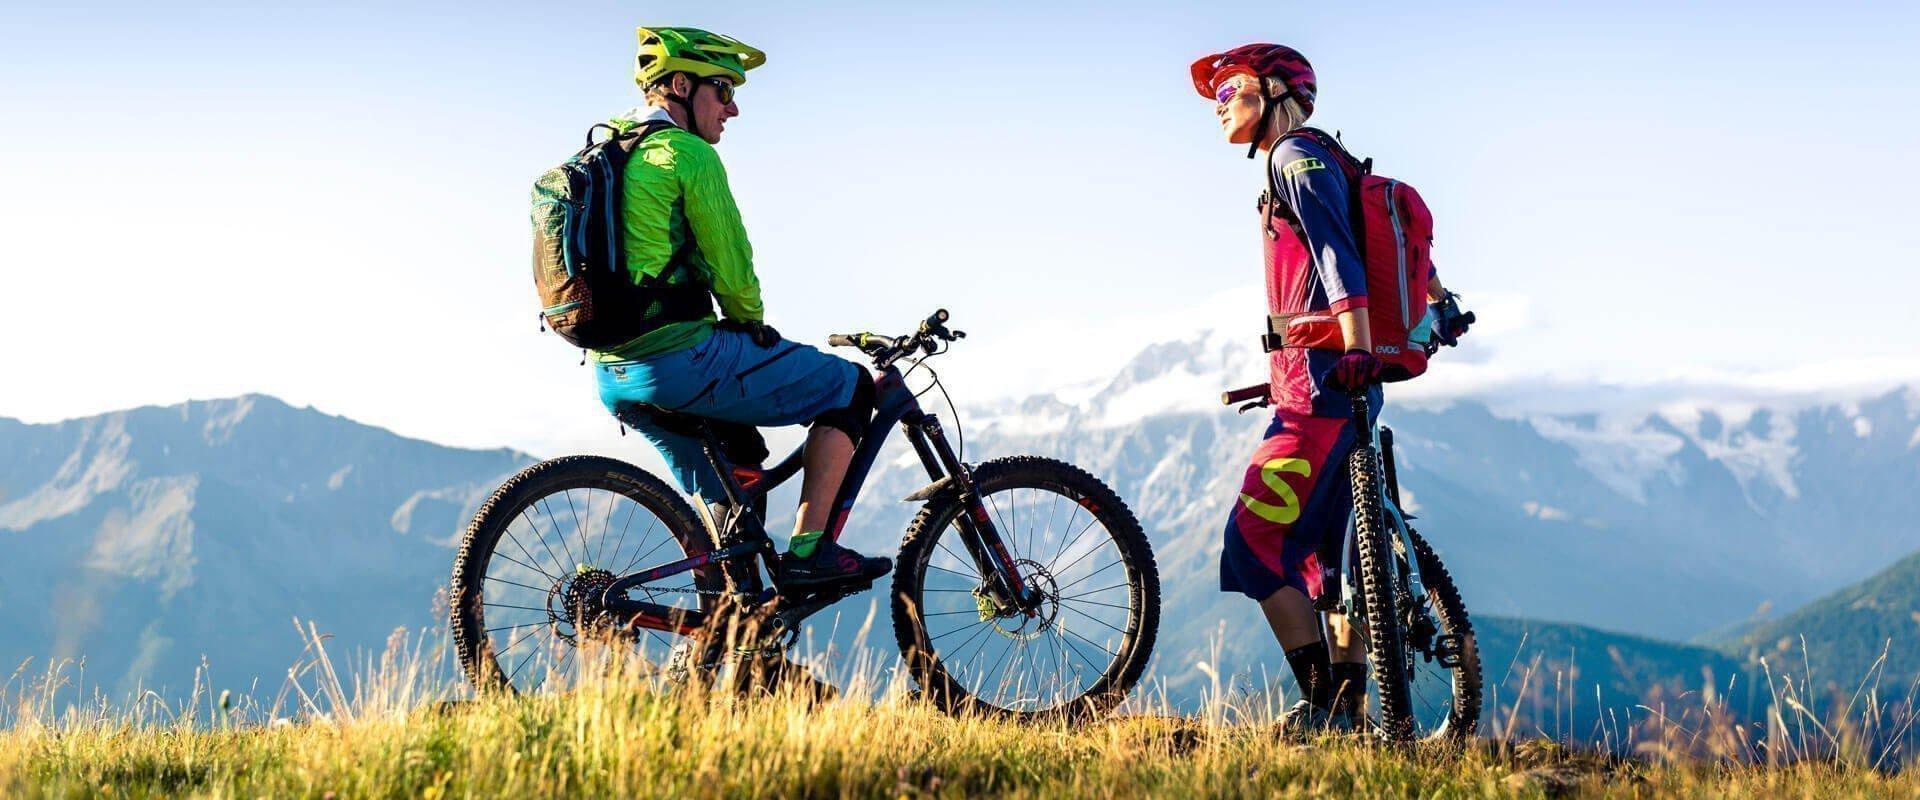 mountainbike-goldrain-latsch-vinschgau-suedtirol